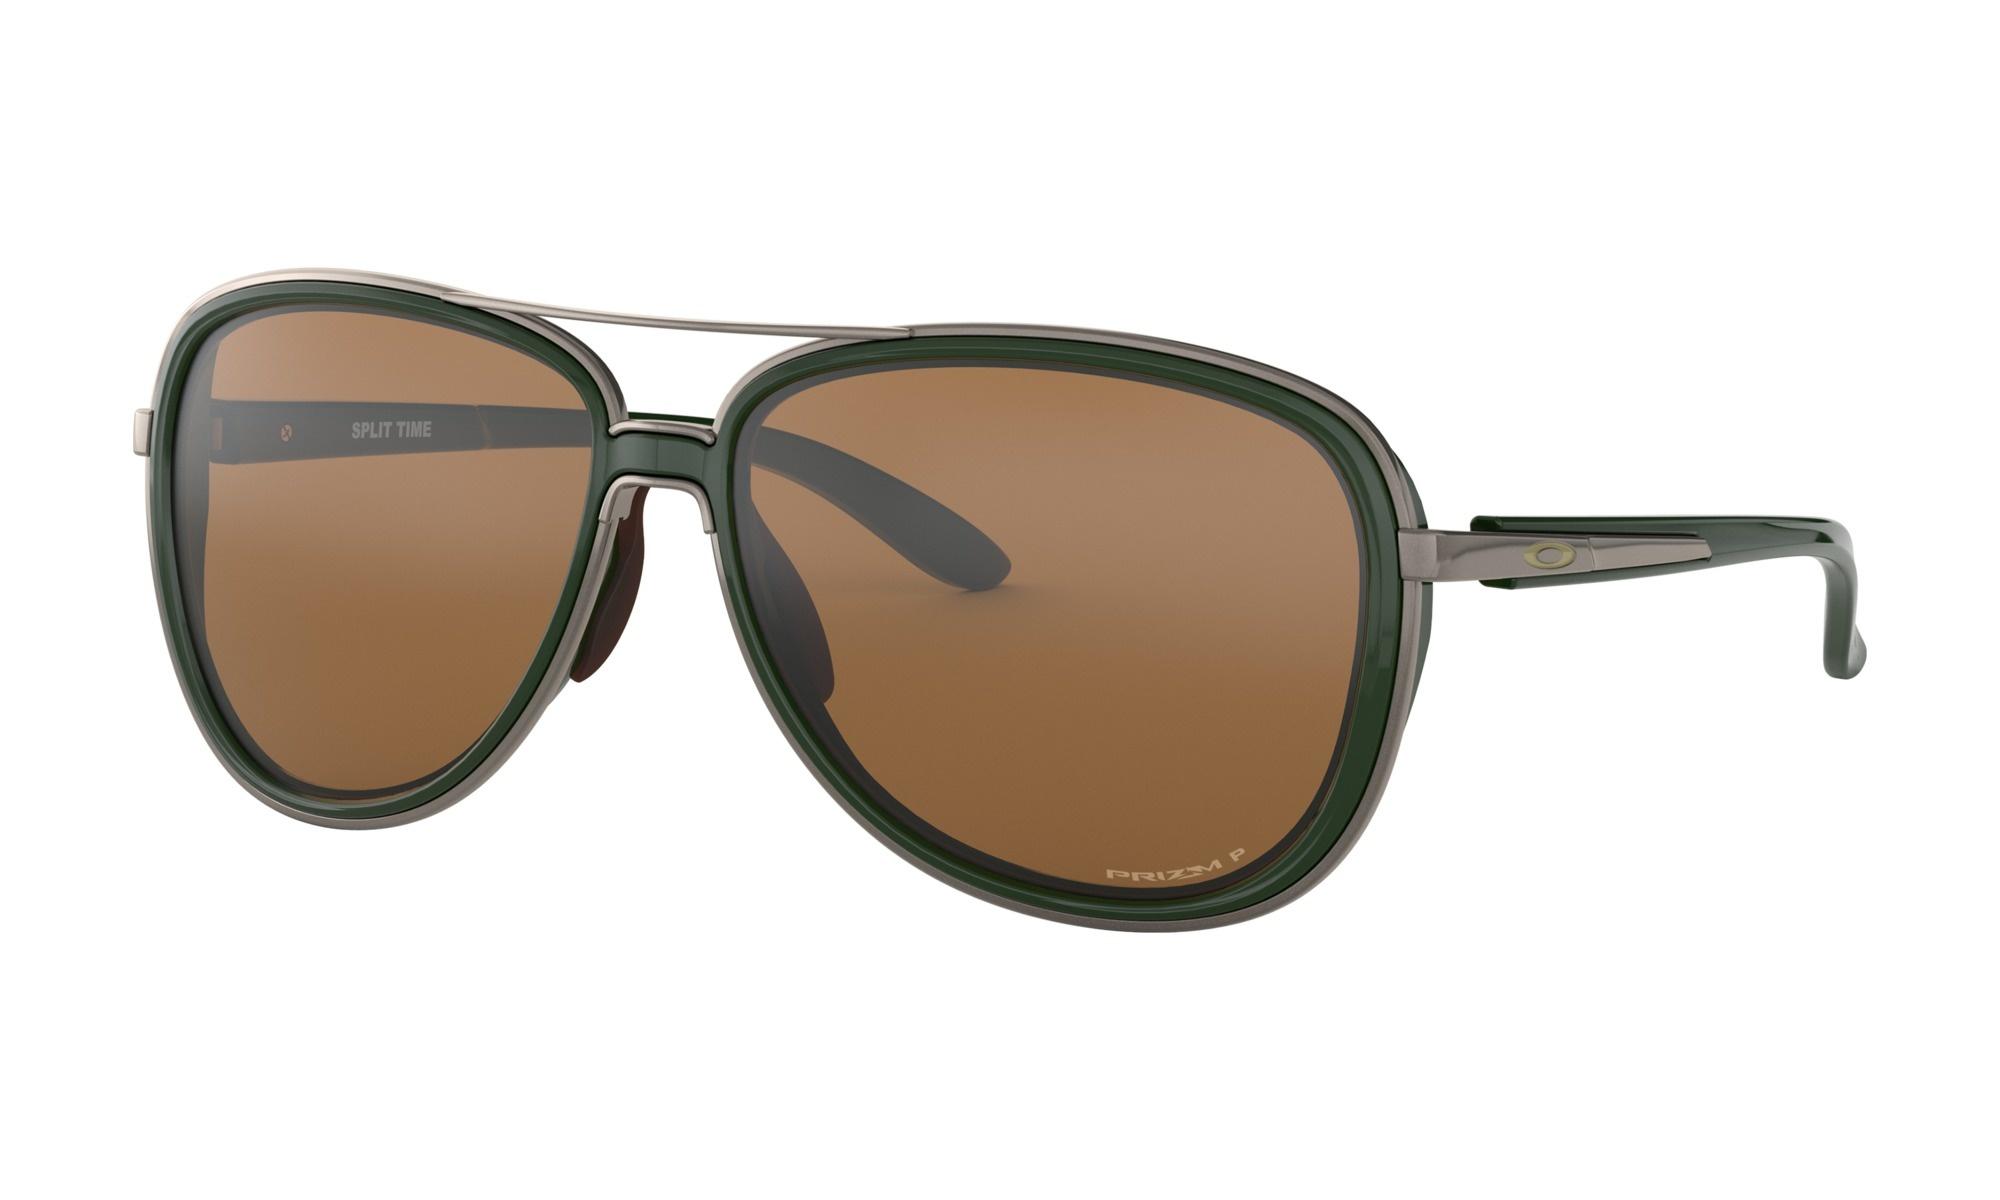 1470833b5 OAKLEY Split Time Forest Sunglasses w/ Prizm Tungsten Polarized Lens. Press  tab to enlarge